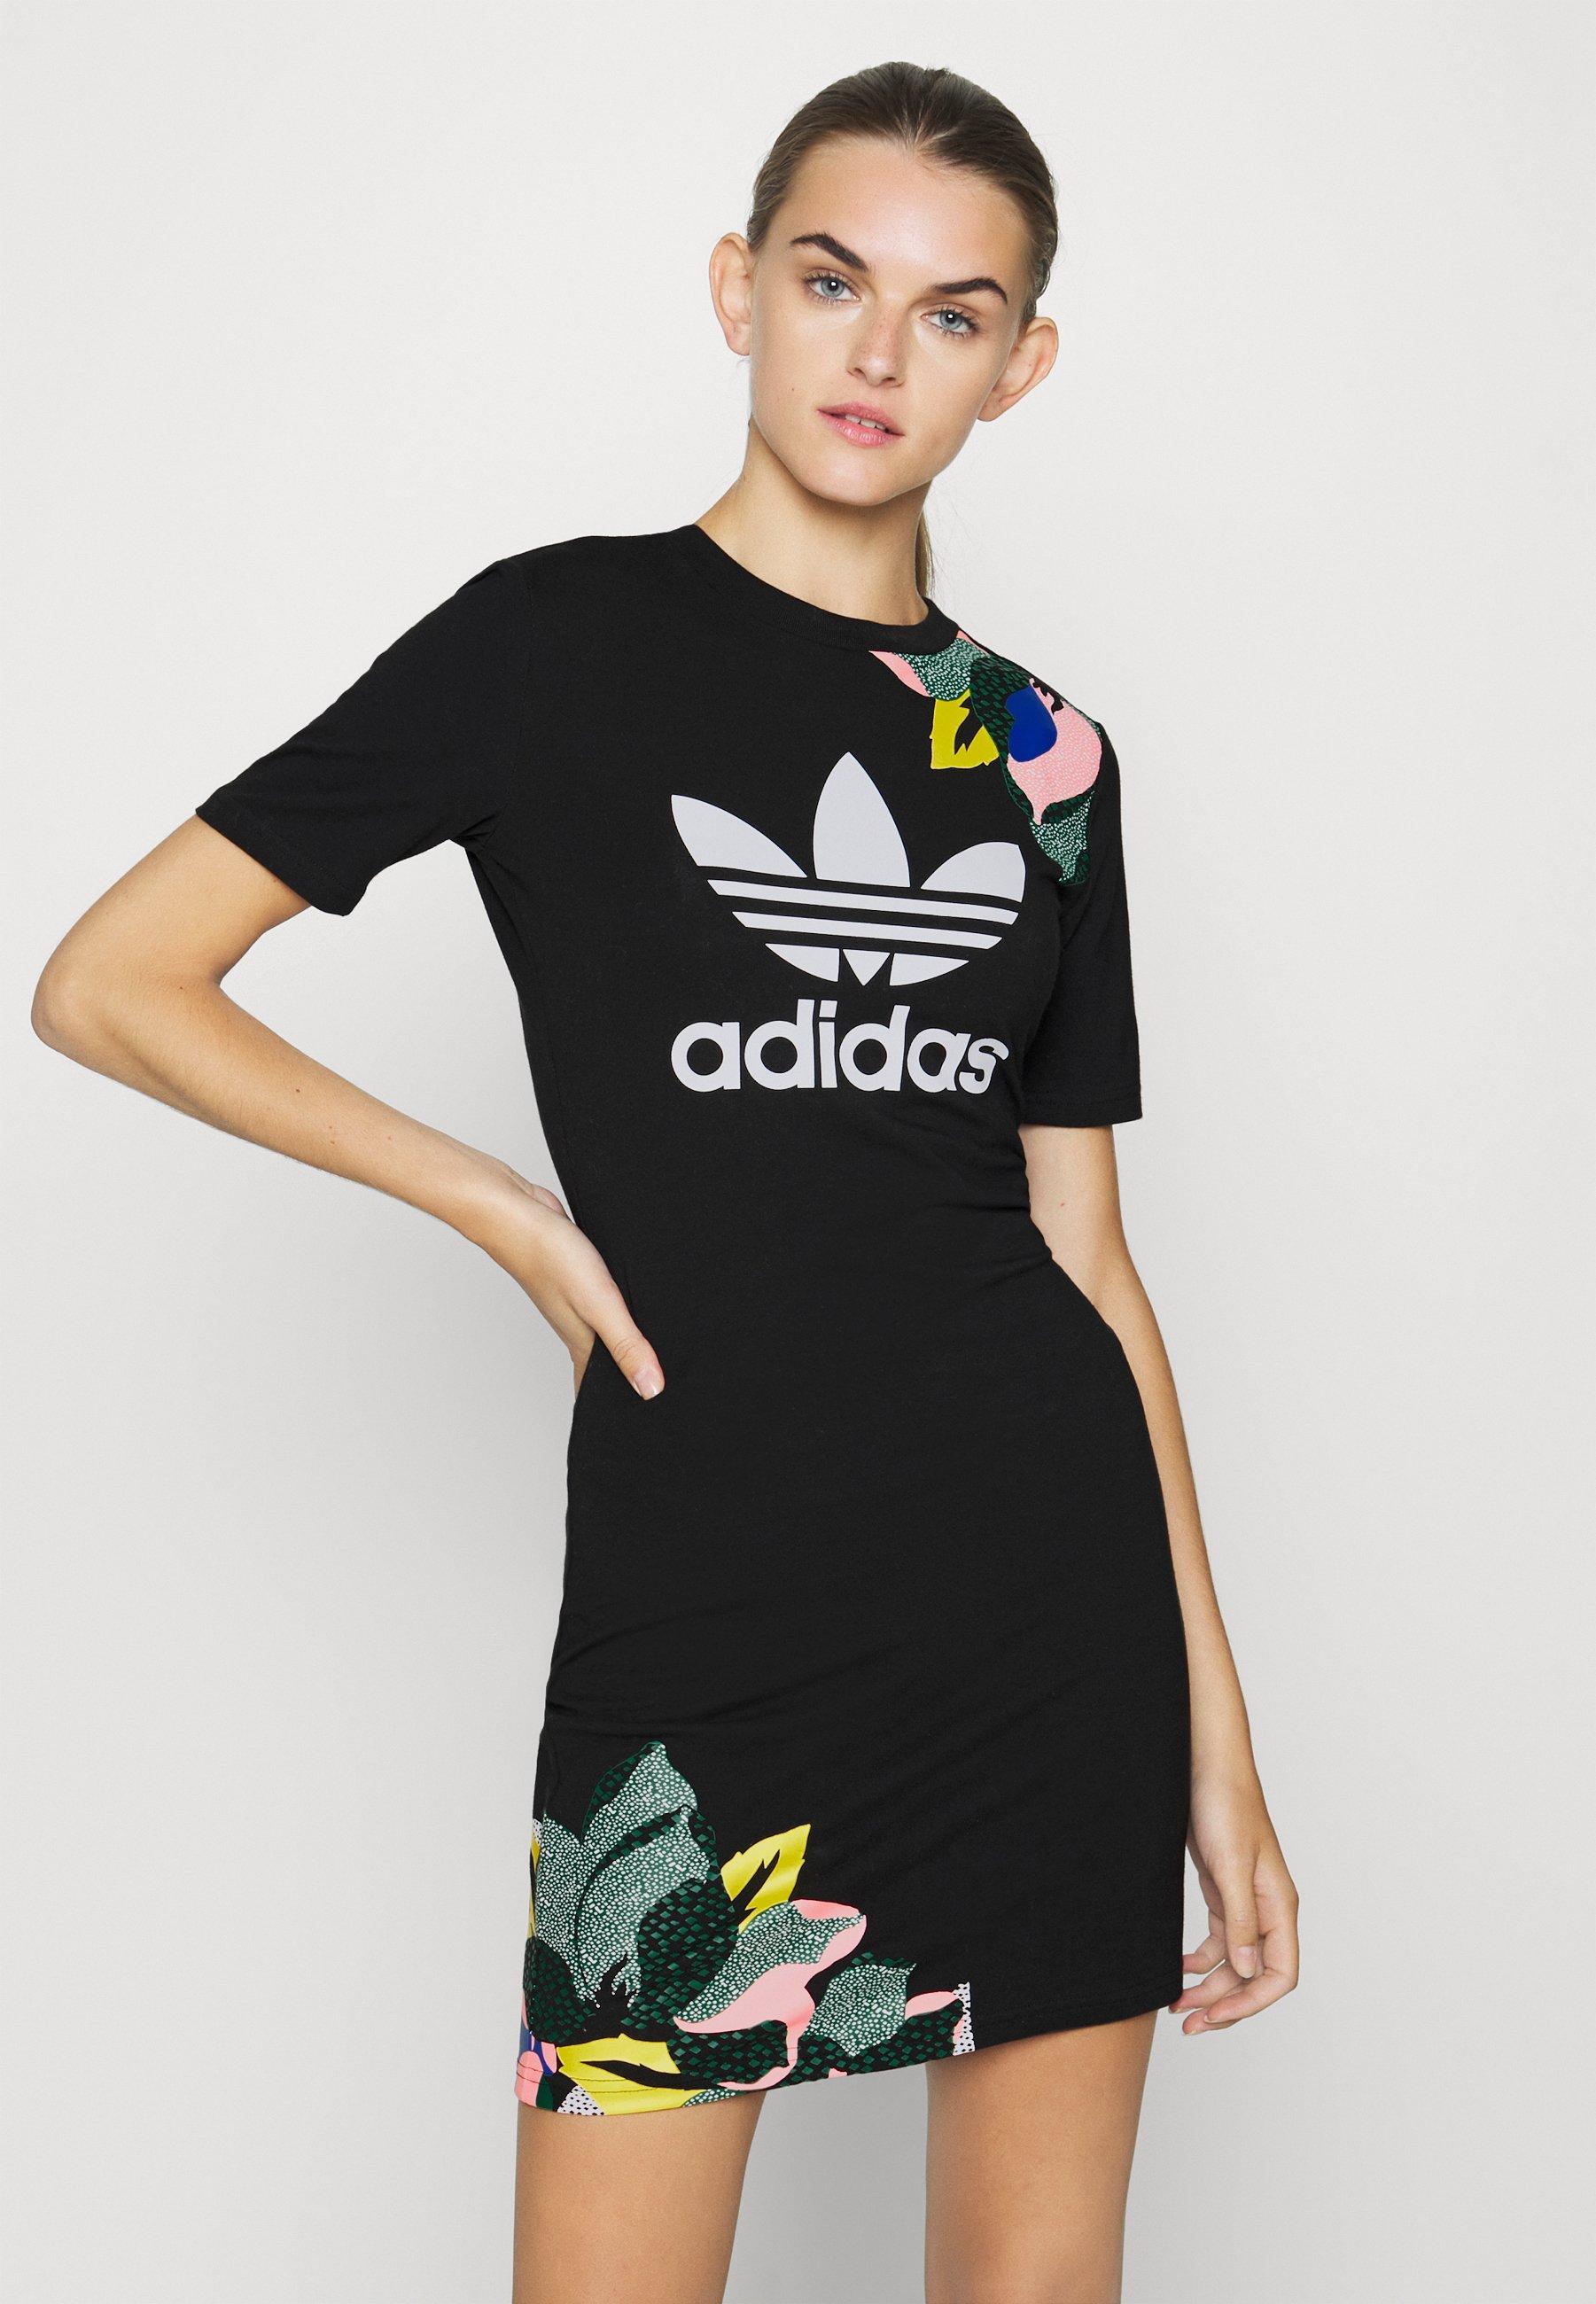 adidas jersey dress off 65% - medpharmres.com